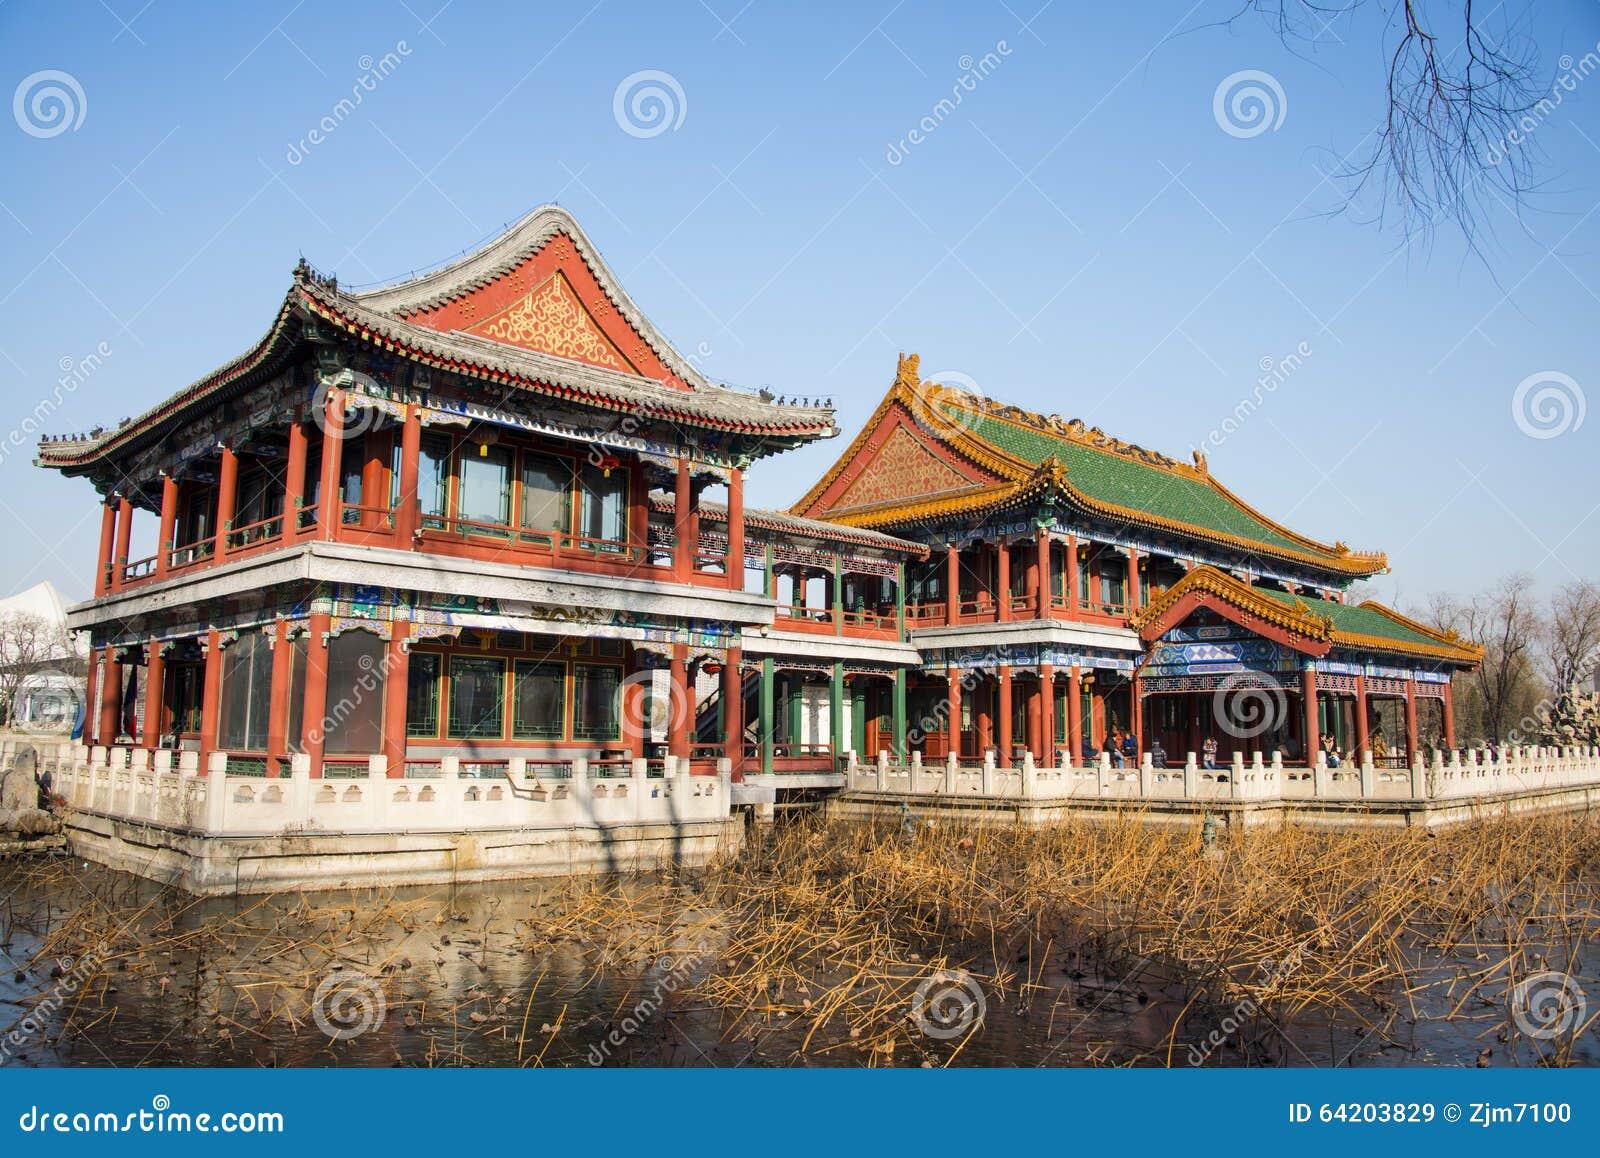 Chino de Asia, parque de Pekín, lago Longtan, edificio del jardín